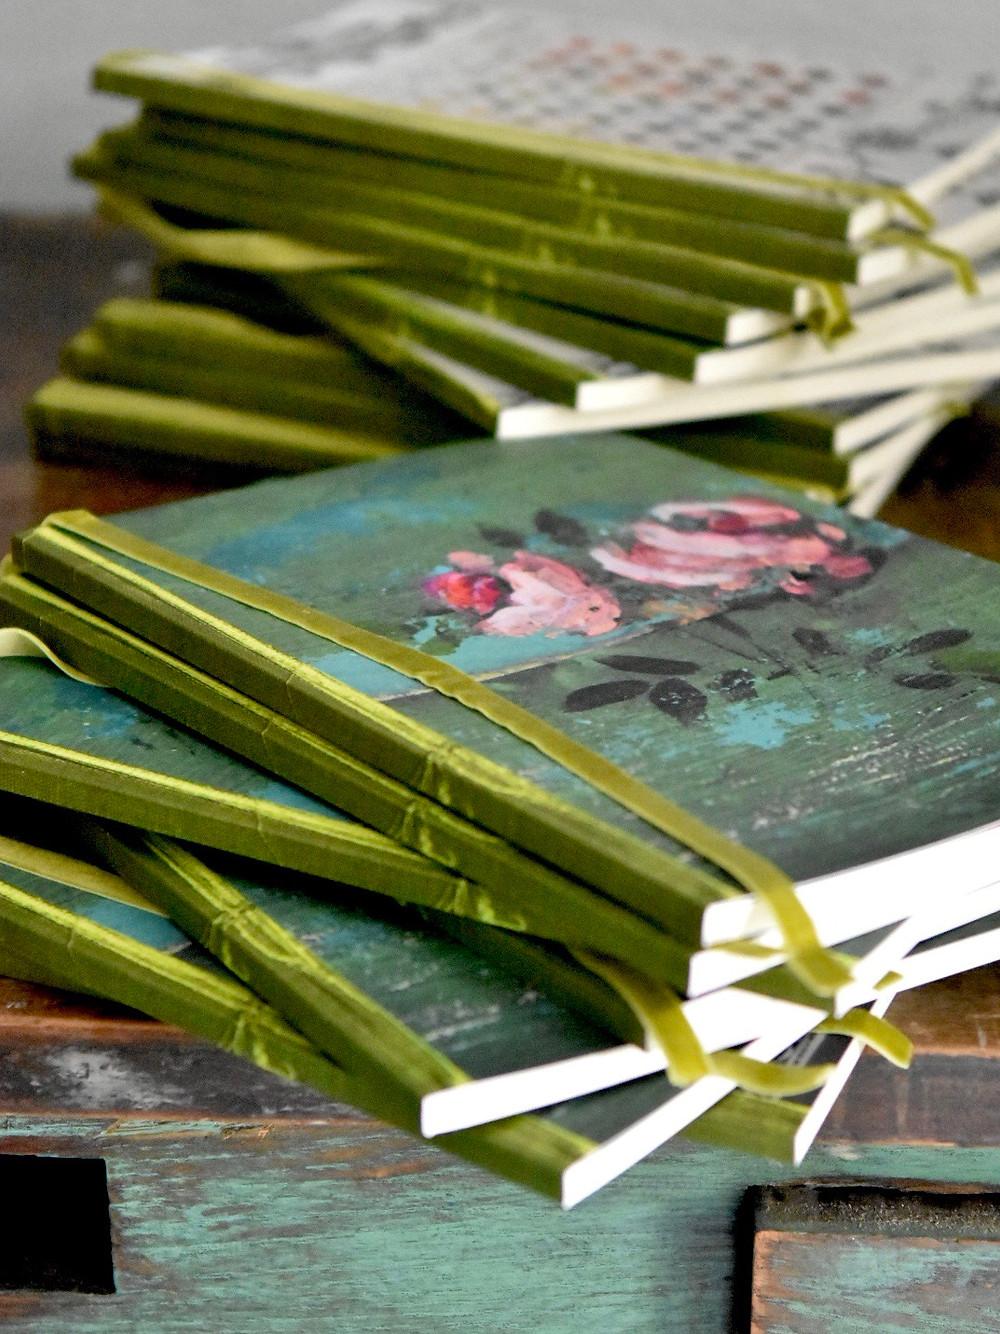 paperback journals by artist Jennifer Lanne